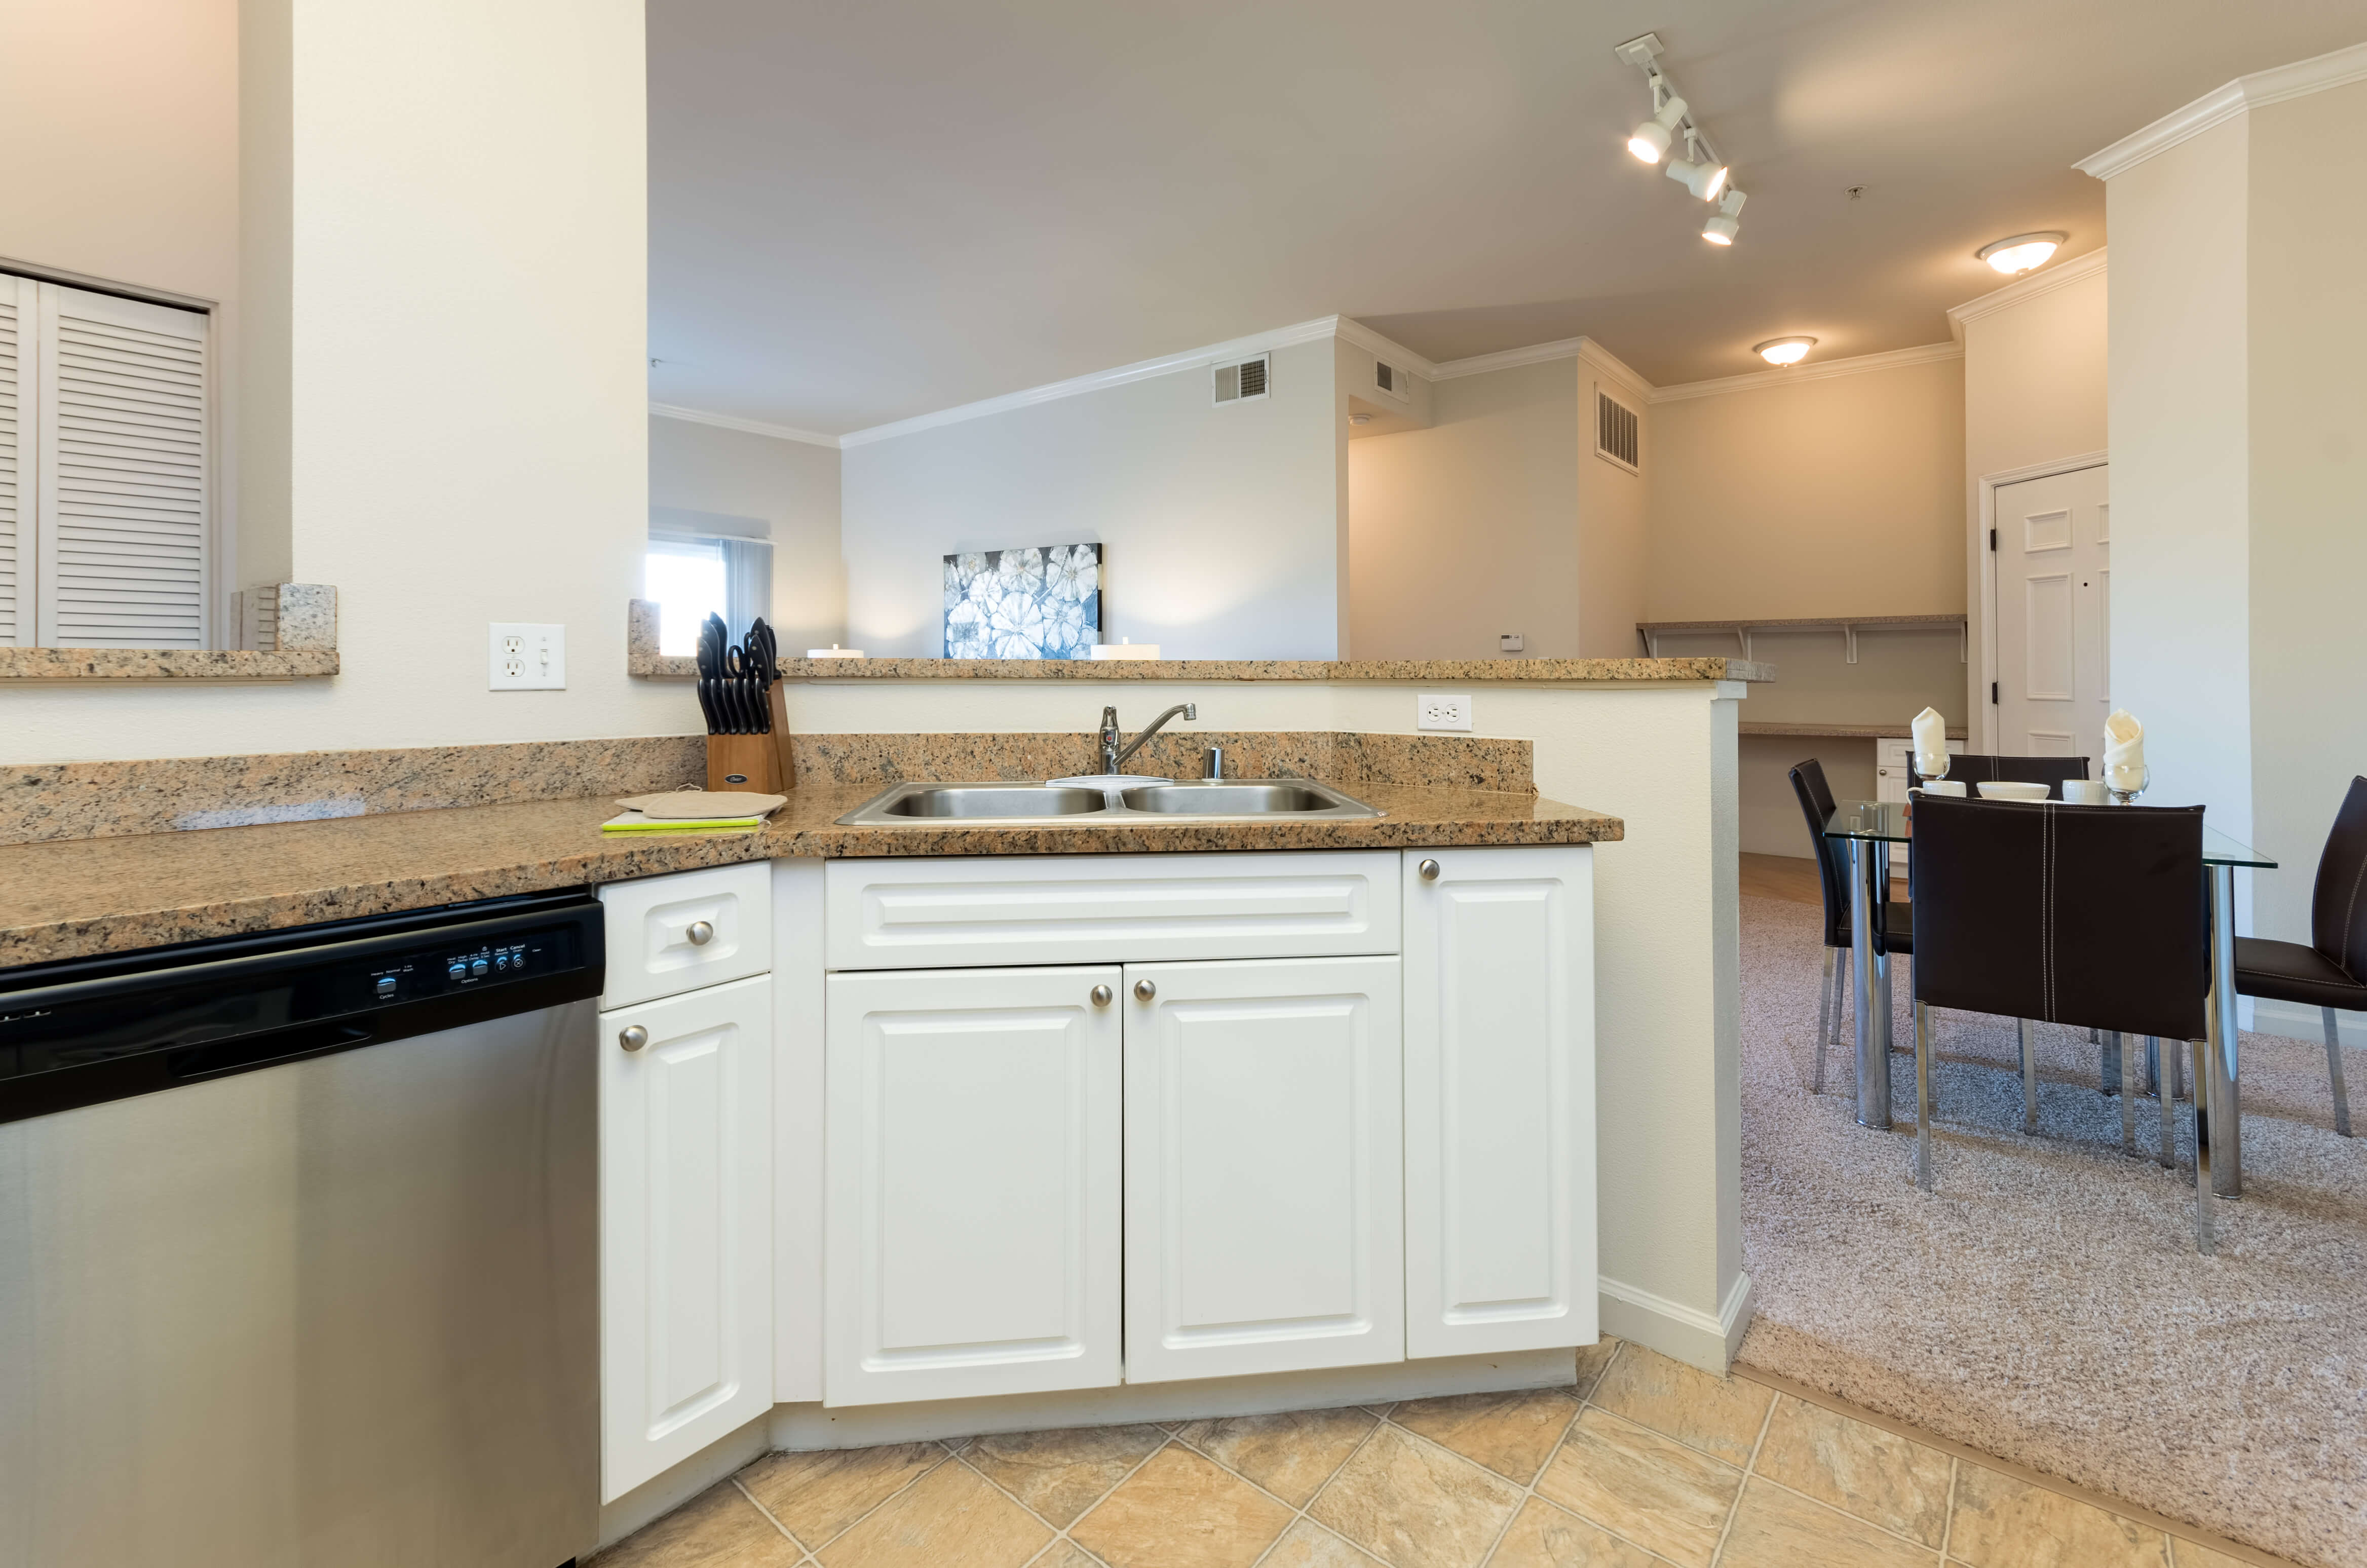 image 6 furnished 3 bedroom Apartment for rent in Santa Clara, Santa Clara County